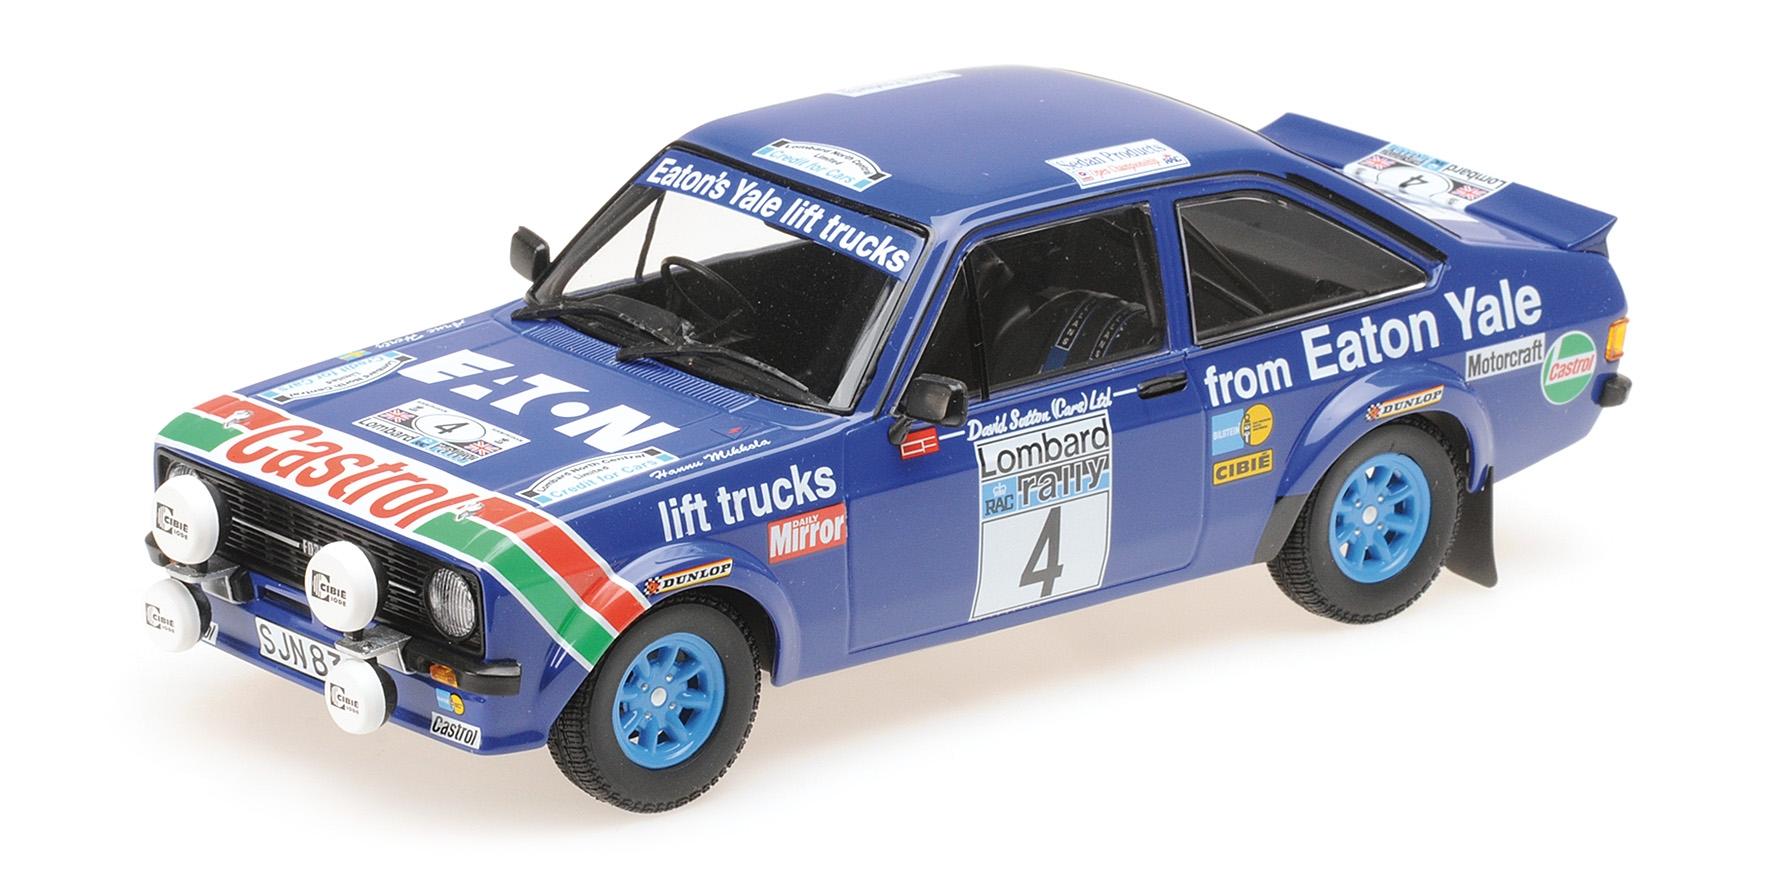 Ford Escort Rs 1800 Castrol Mikkola Hertz Winners Lombard Rac Rally 1978 Minicha